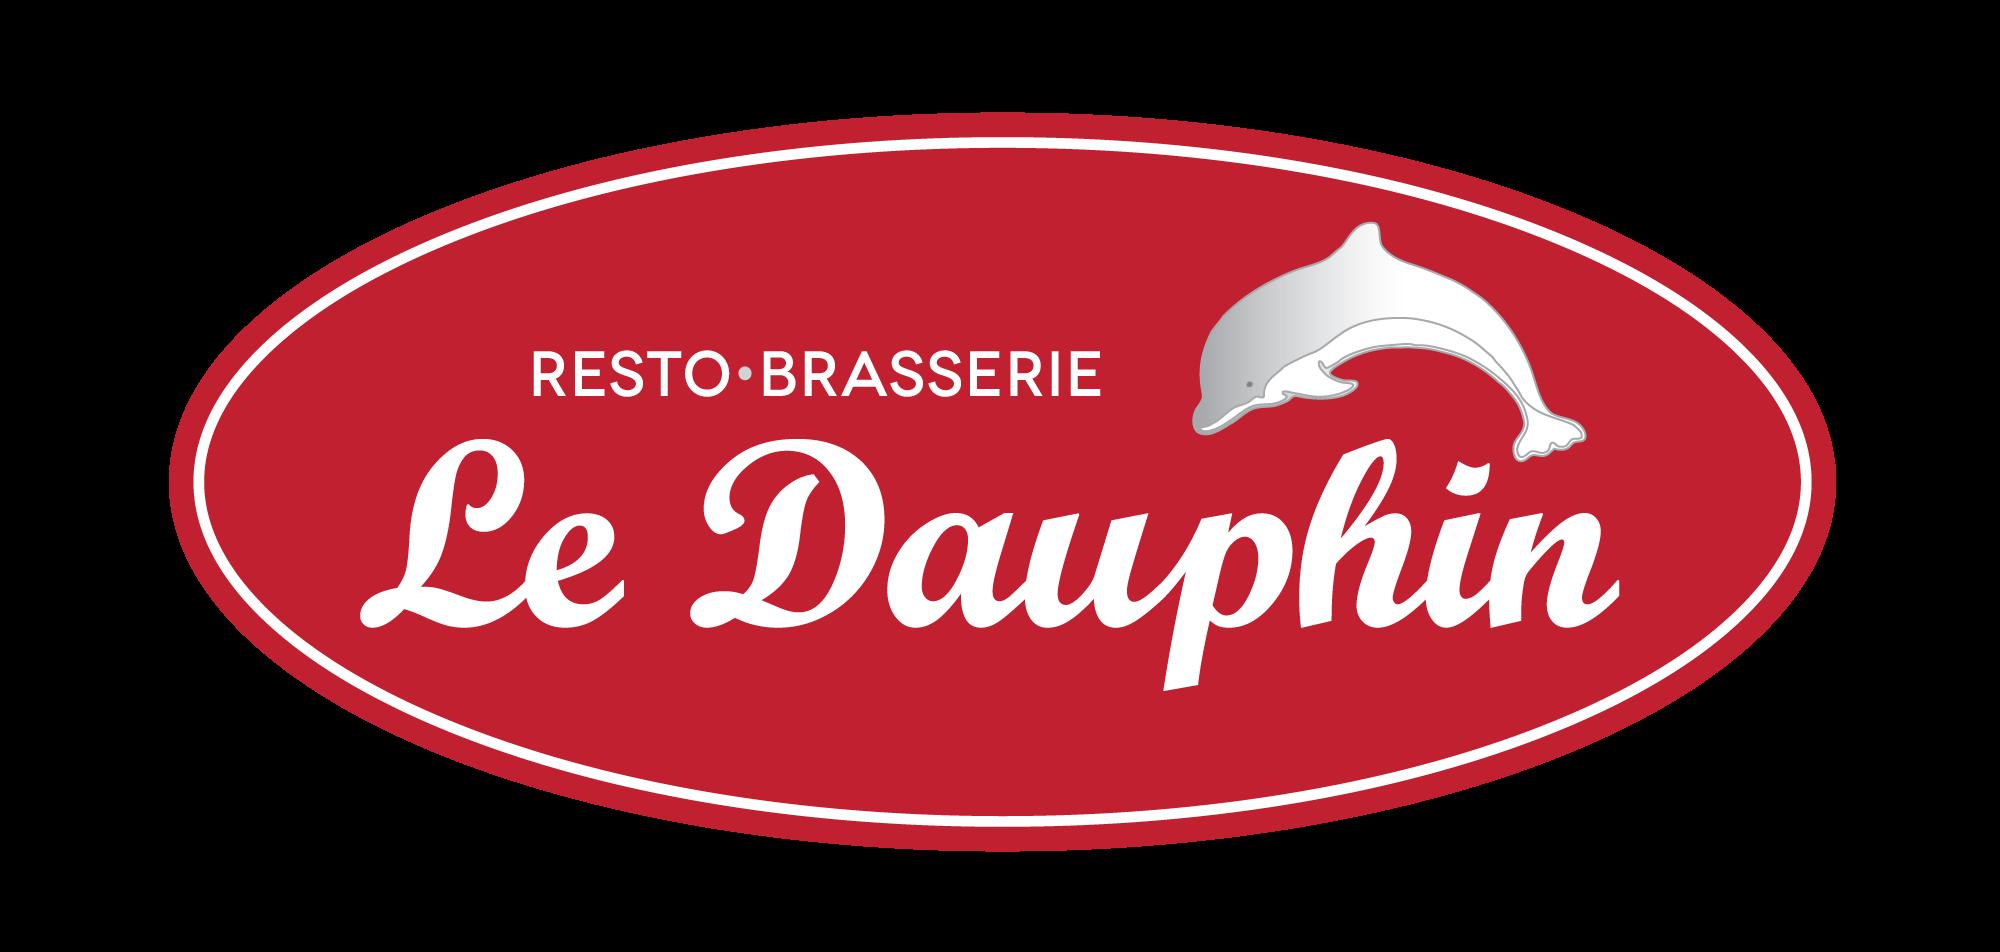 Brasserie Le Dauphin